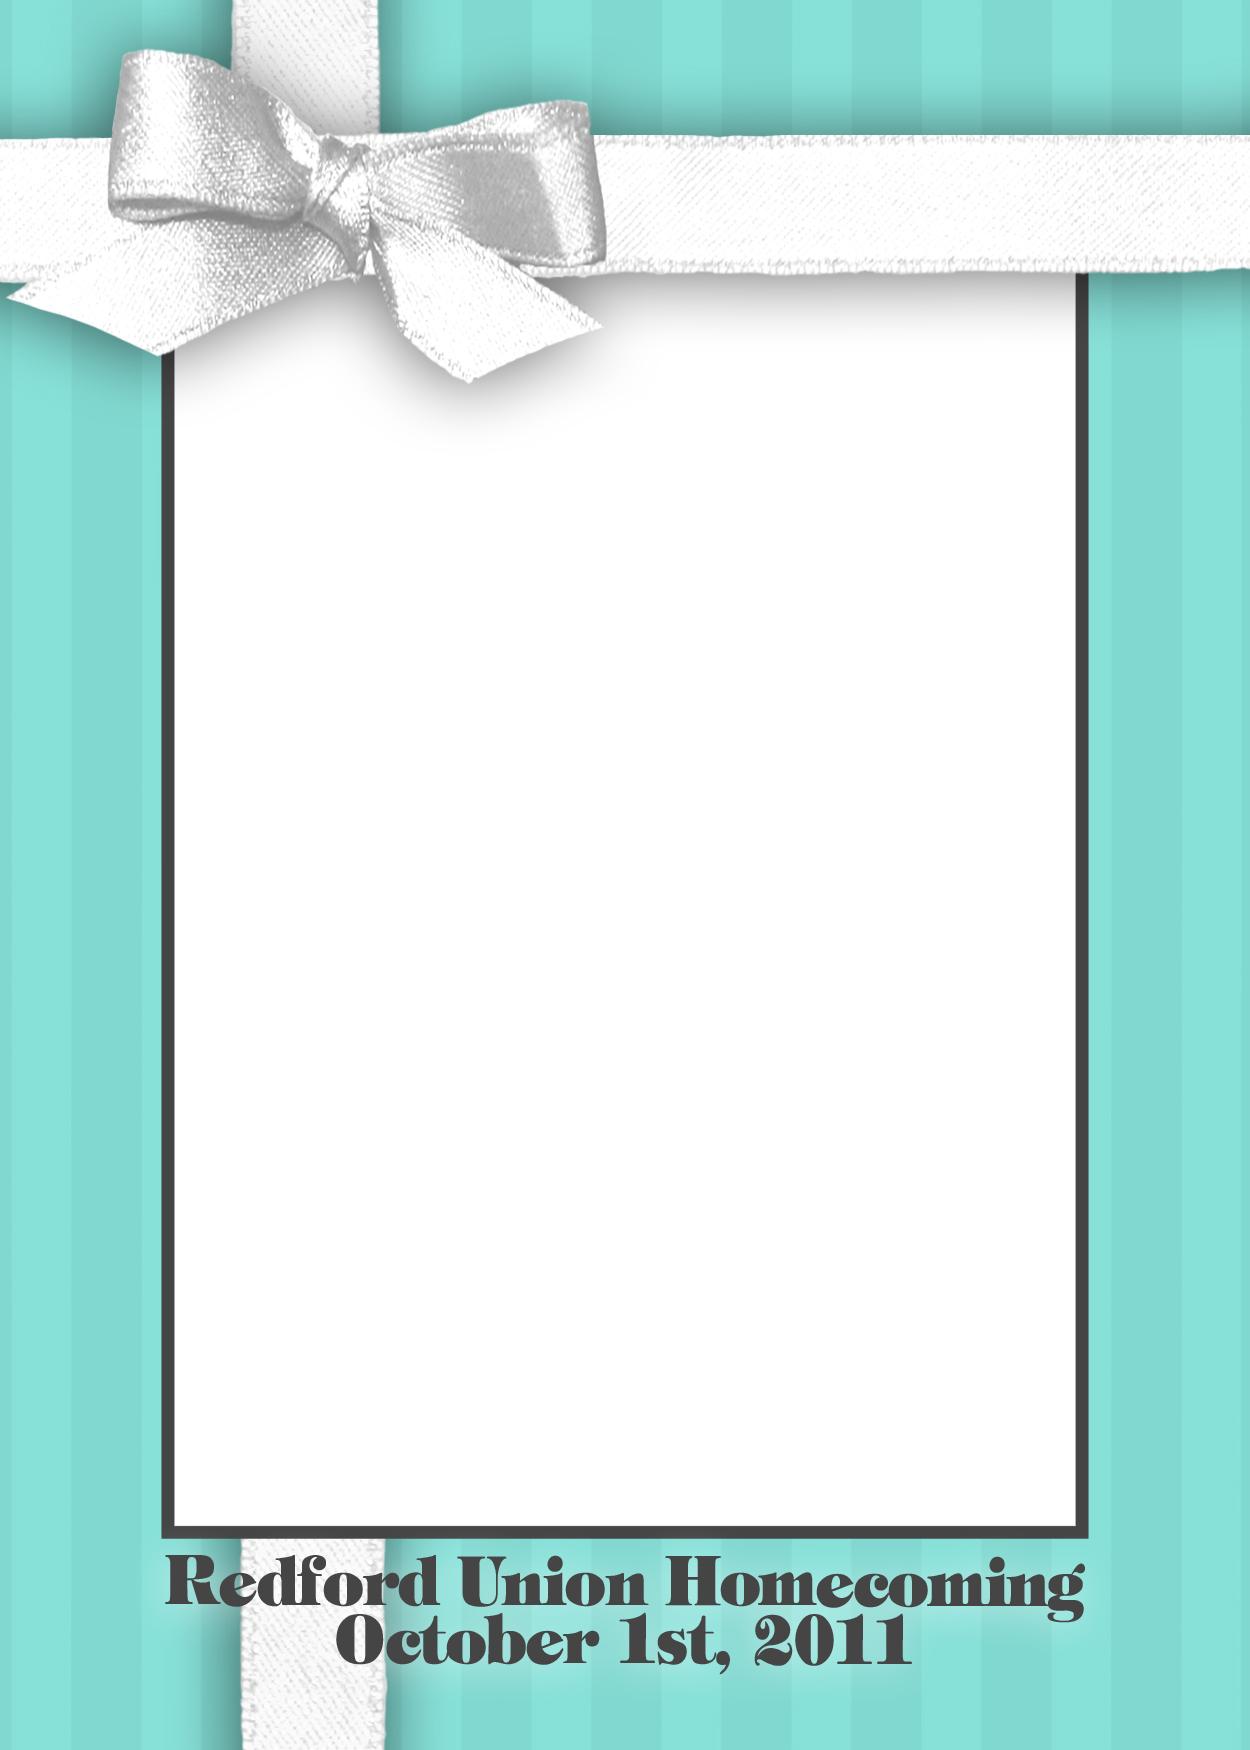 border_plain_8_V copy.jpg